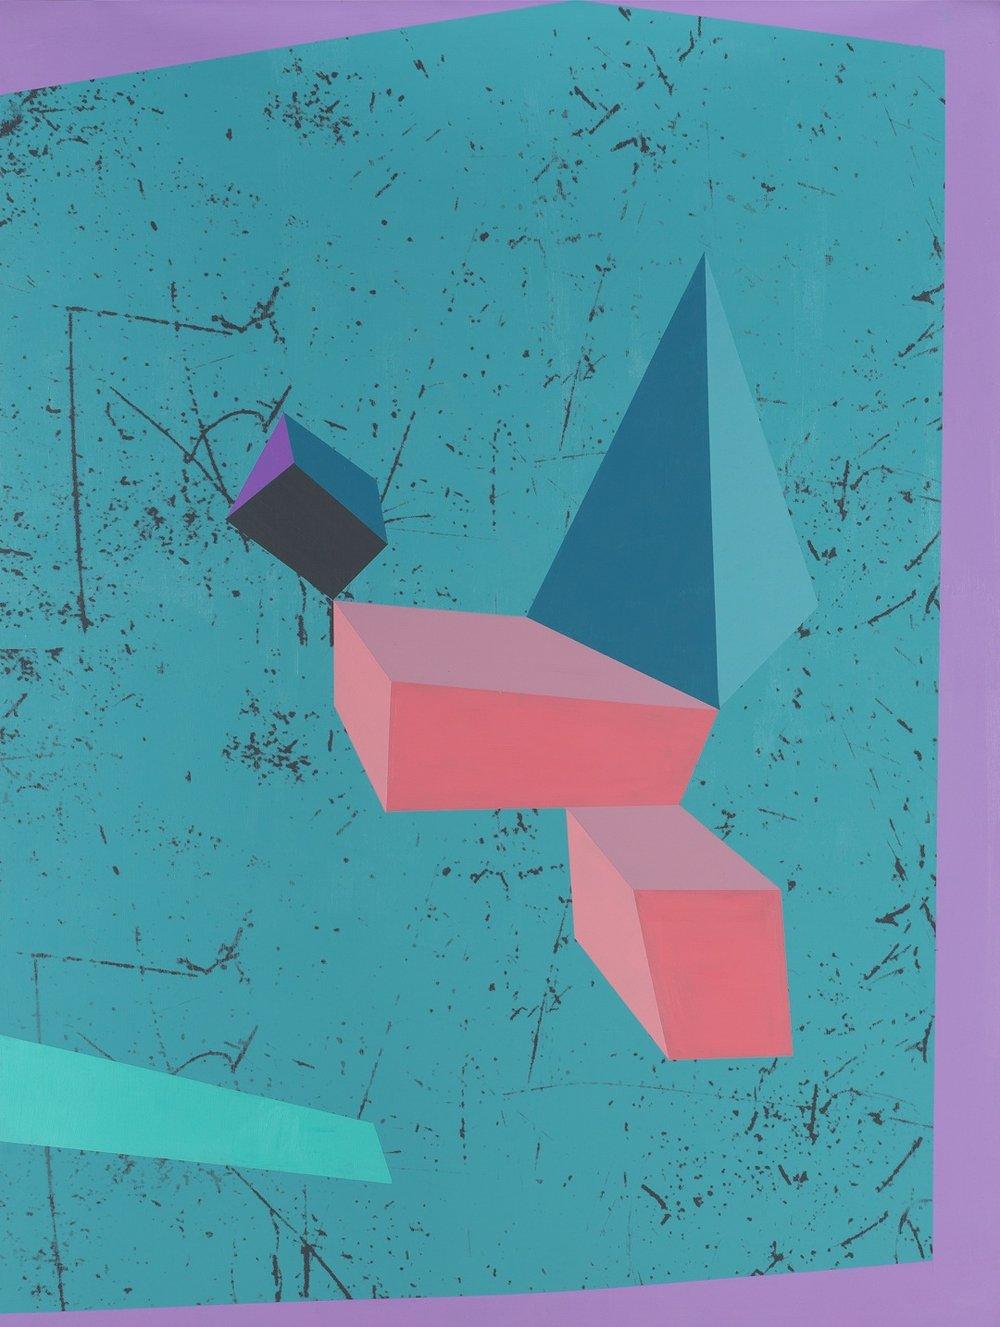 Image:  untitled  Ben Rak screen print on board, 2017